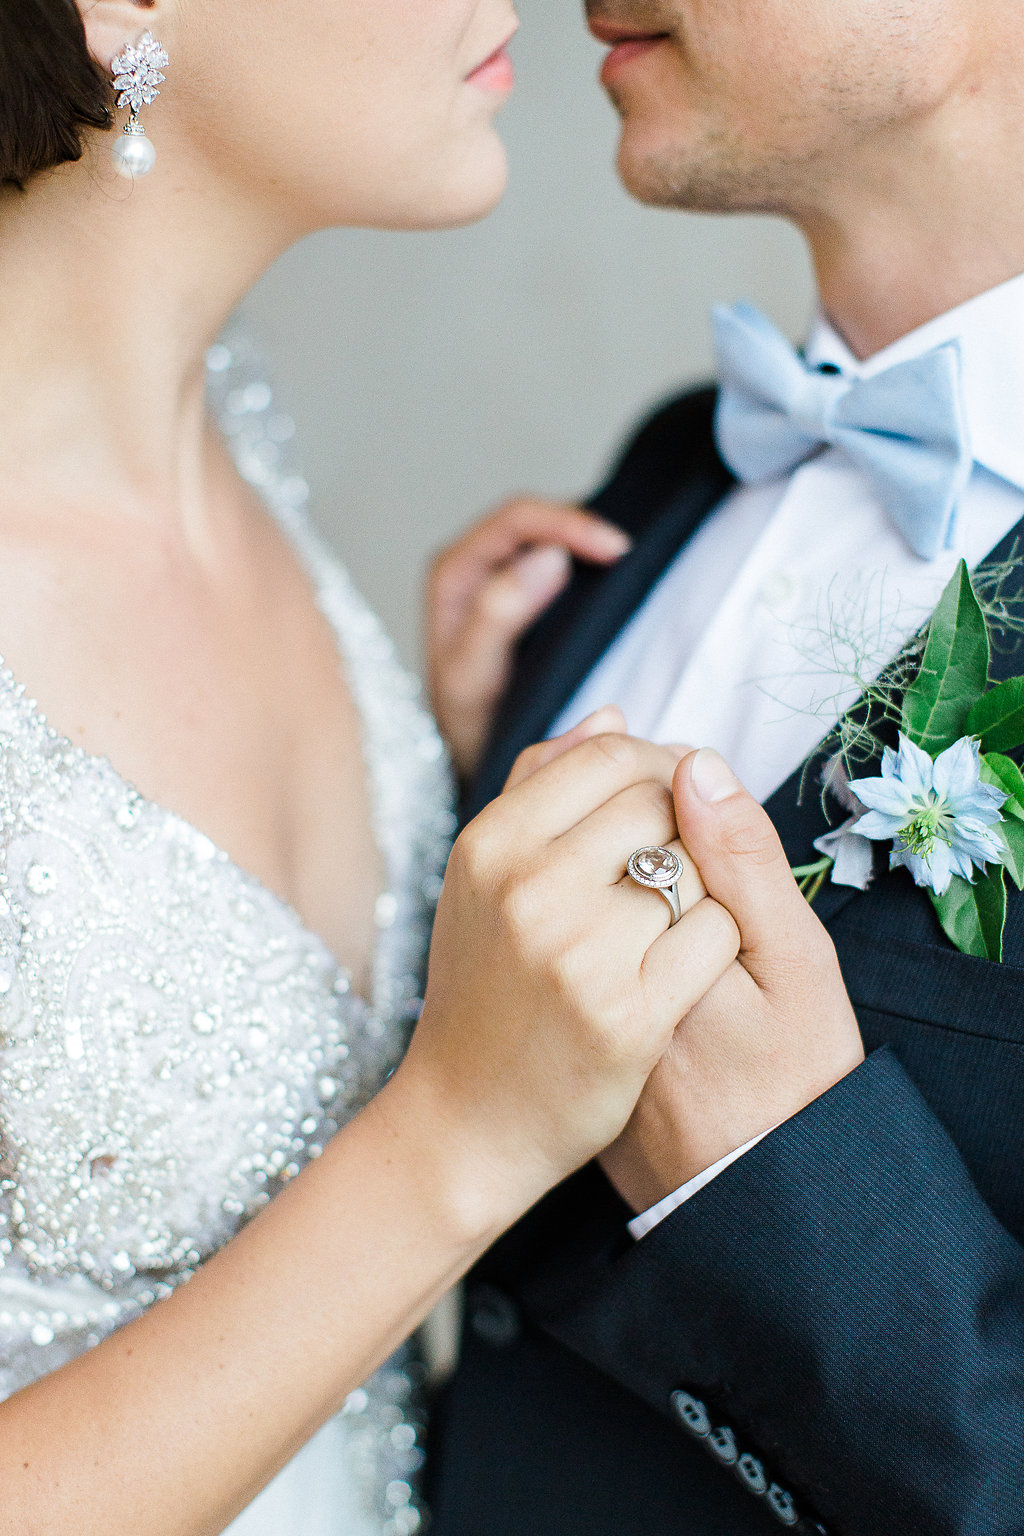 Verona-Destination-Wedding-Inspiration-by-Kibogo-Photography18.jpg